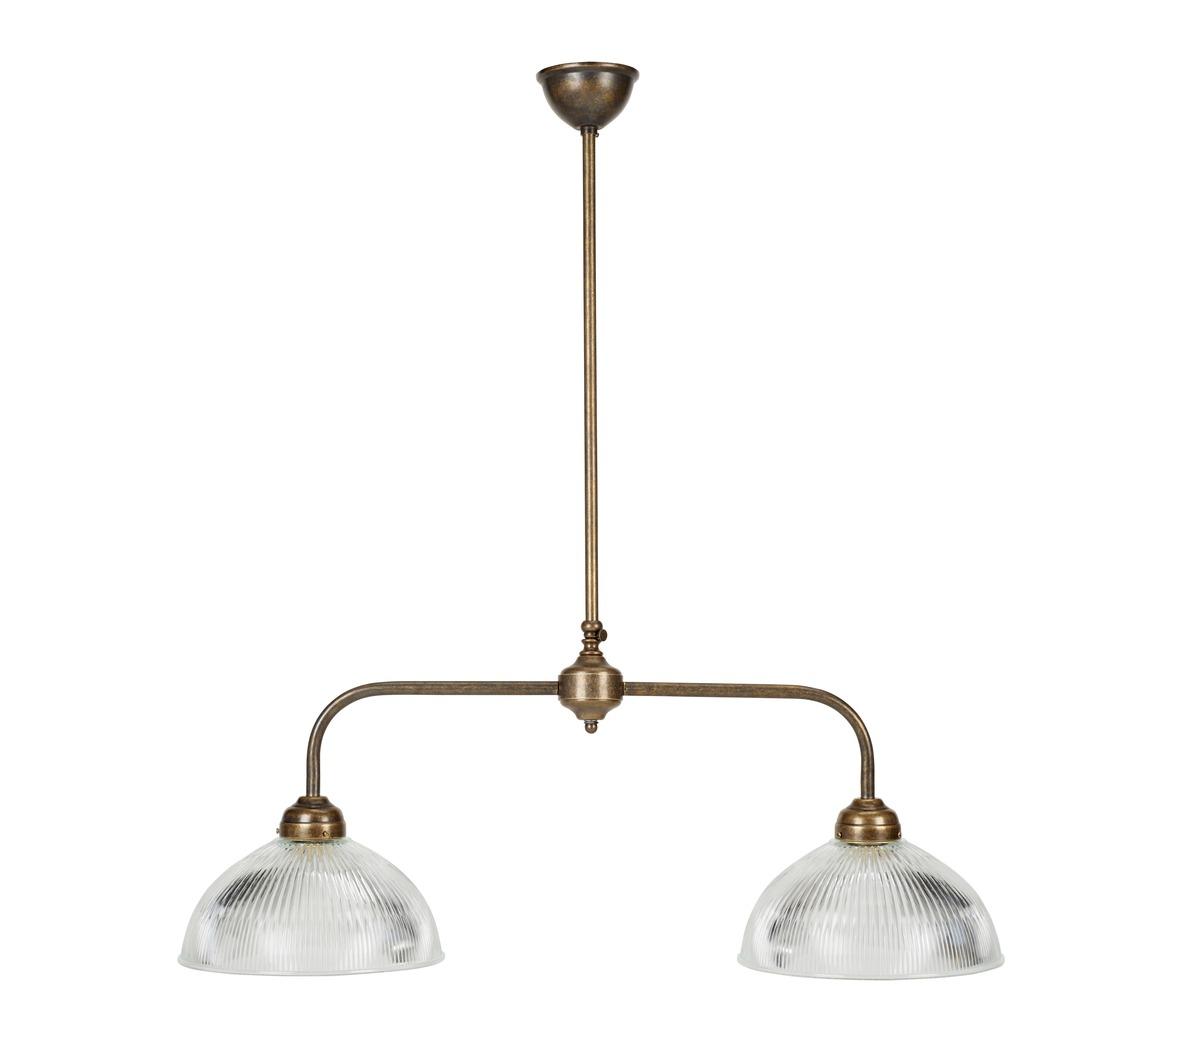 Lighting Pendant Billiard Lamps Double Billiard Lamp The Fre